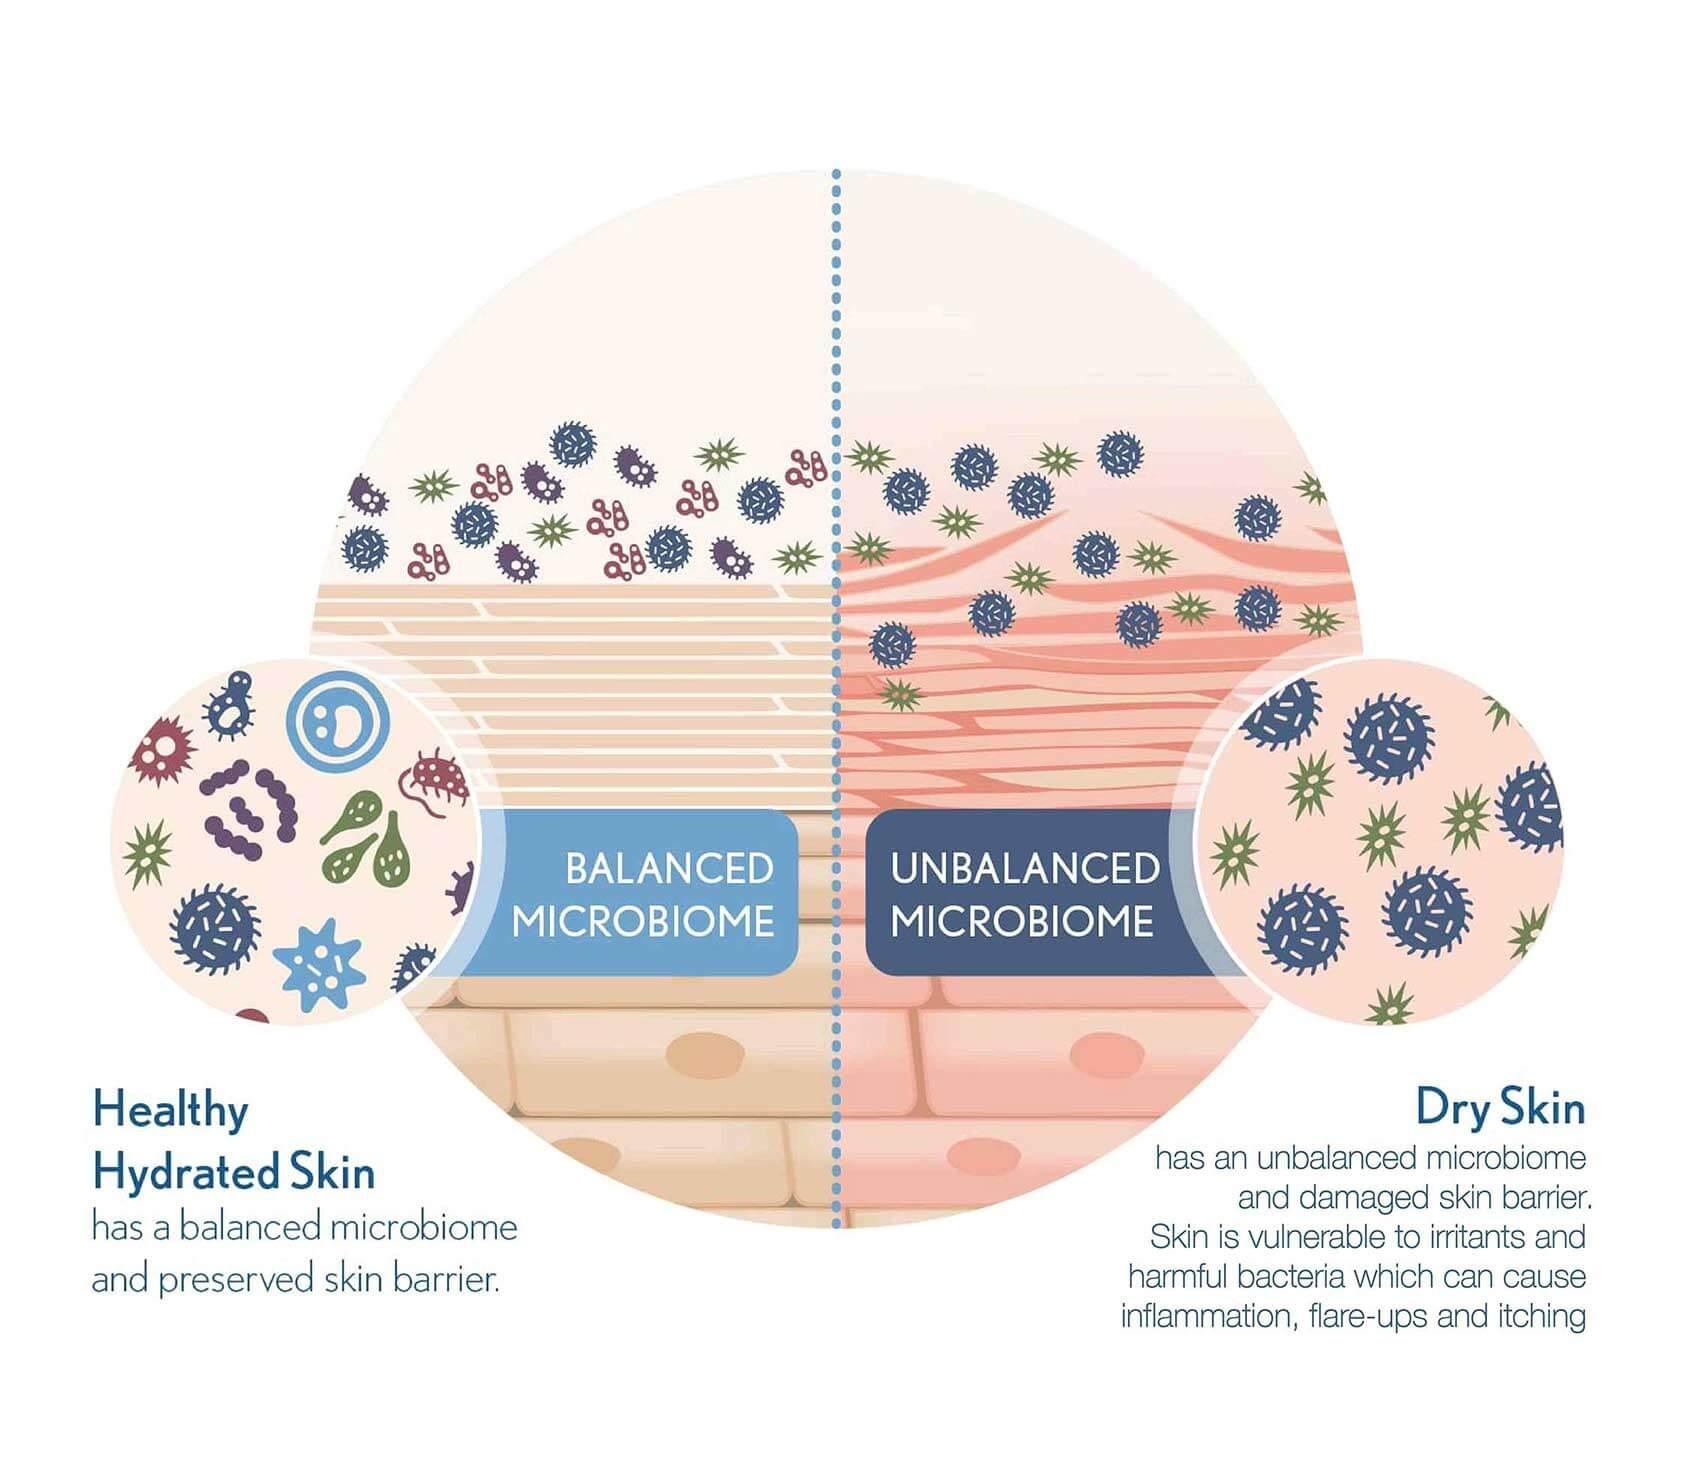 Skin Microbiome diagram